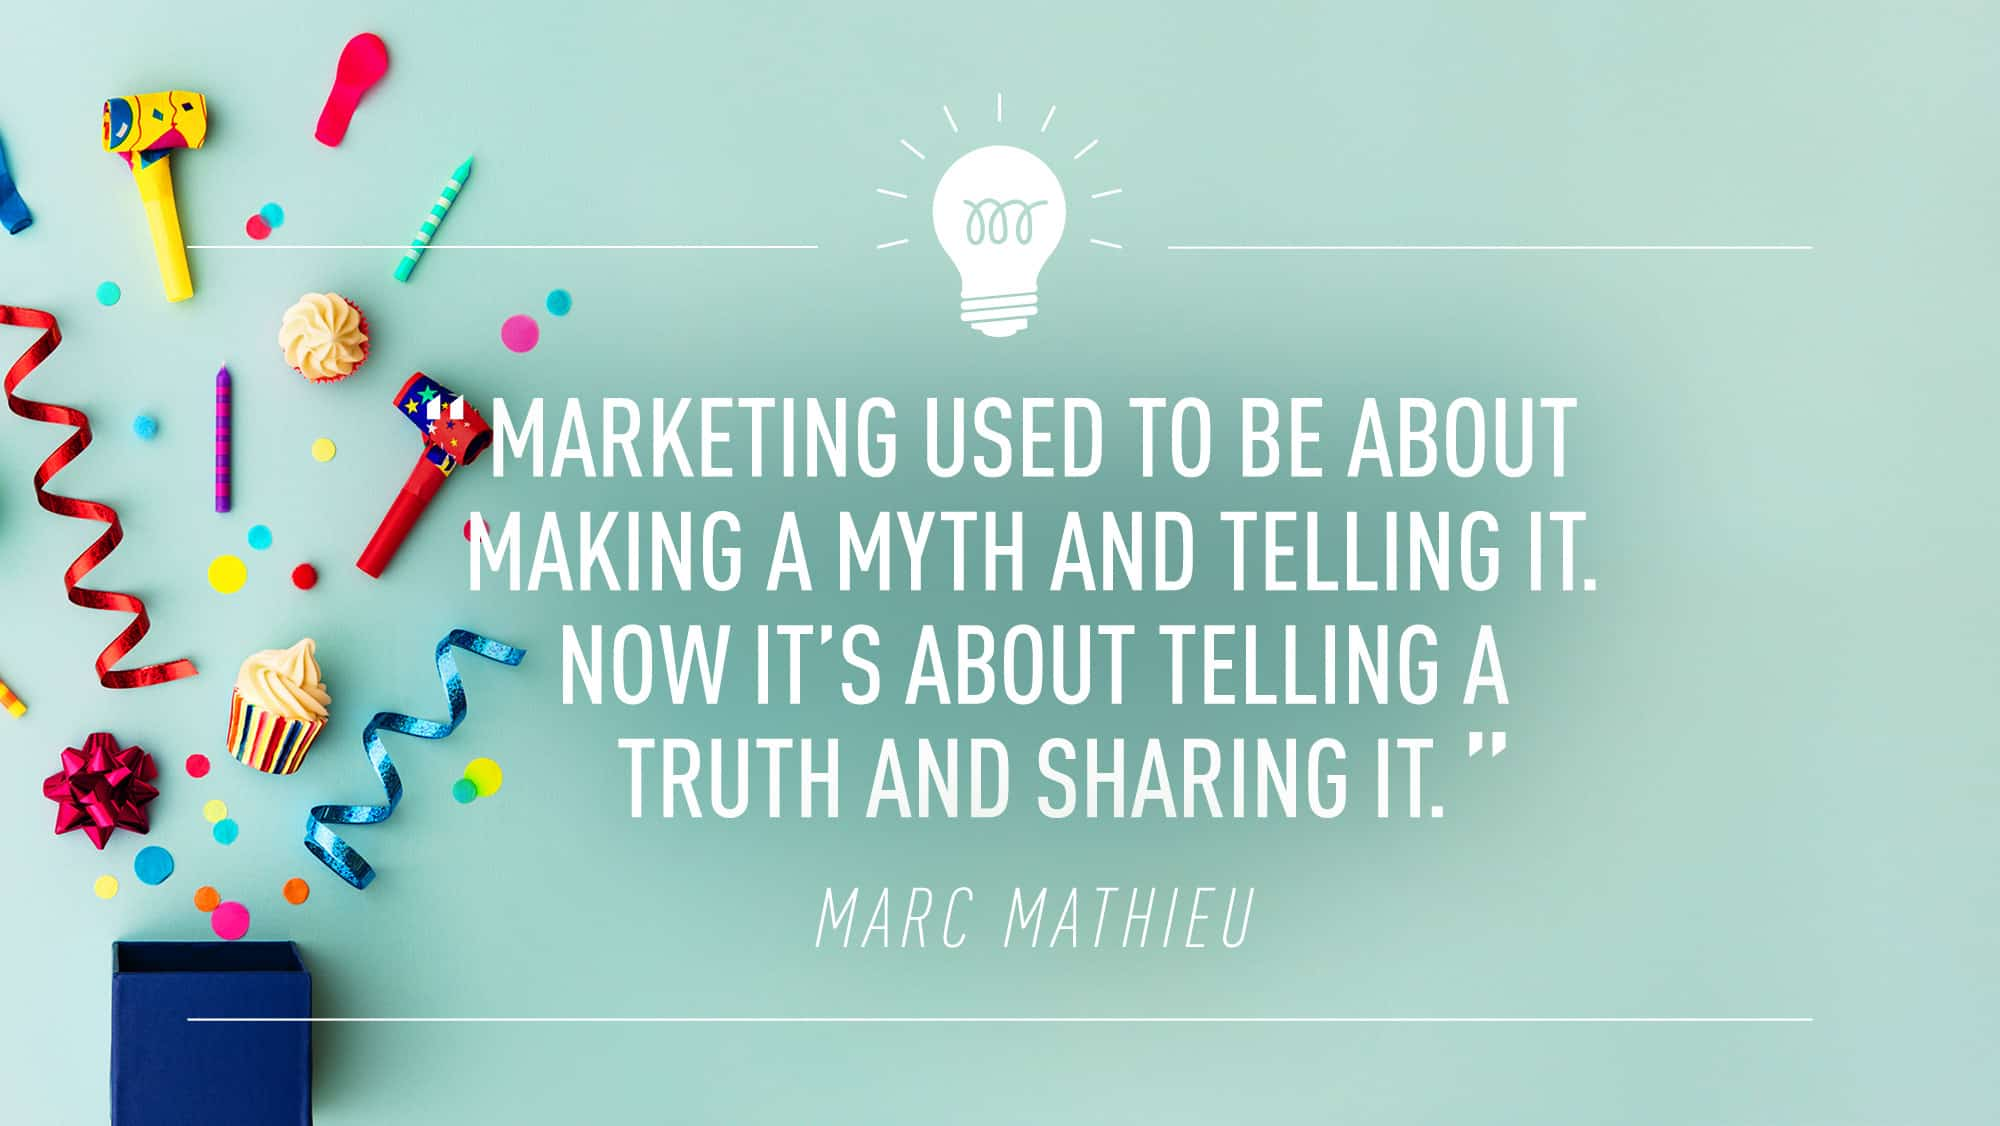 Marketing Myth Quotes